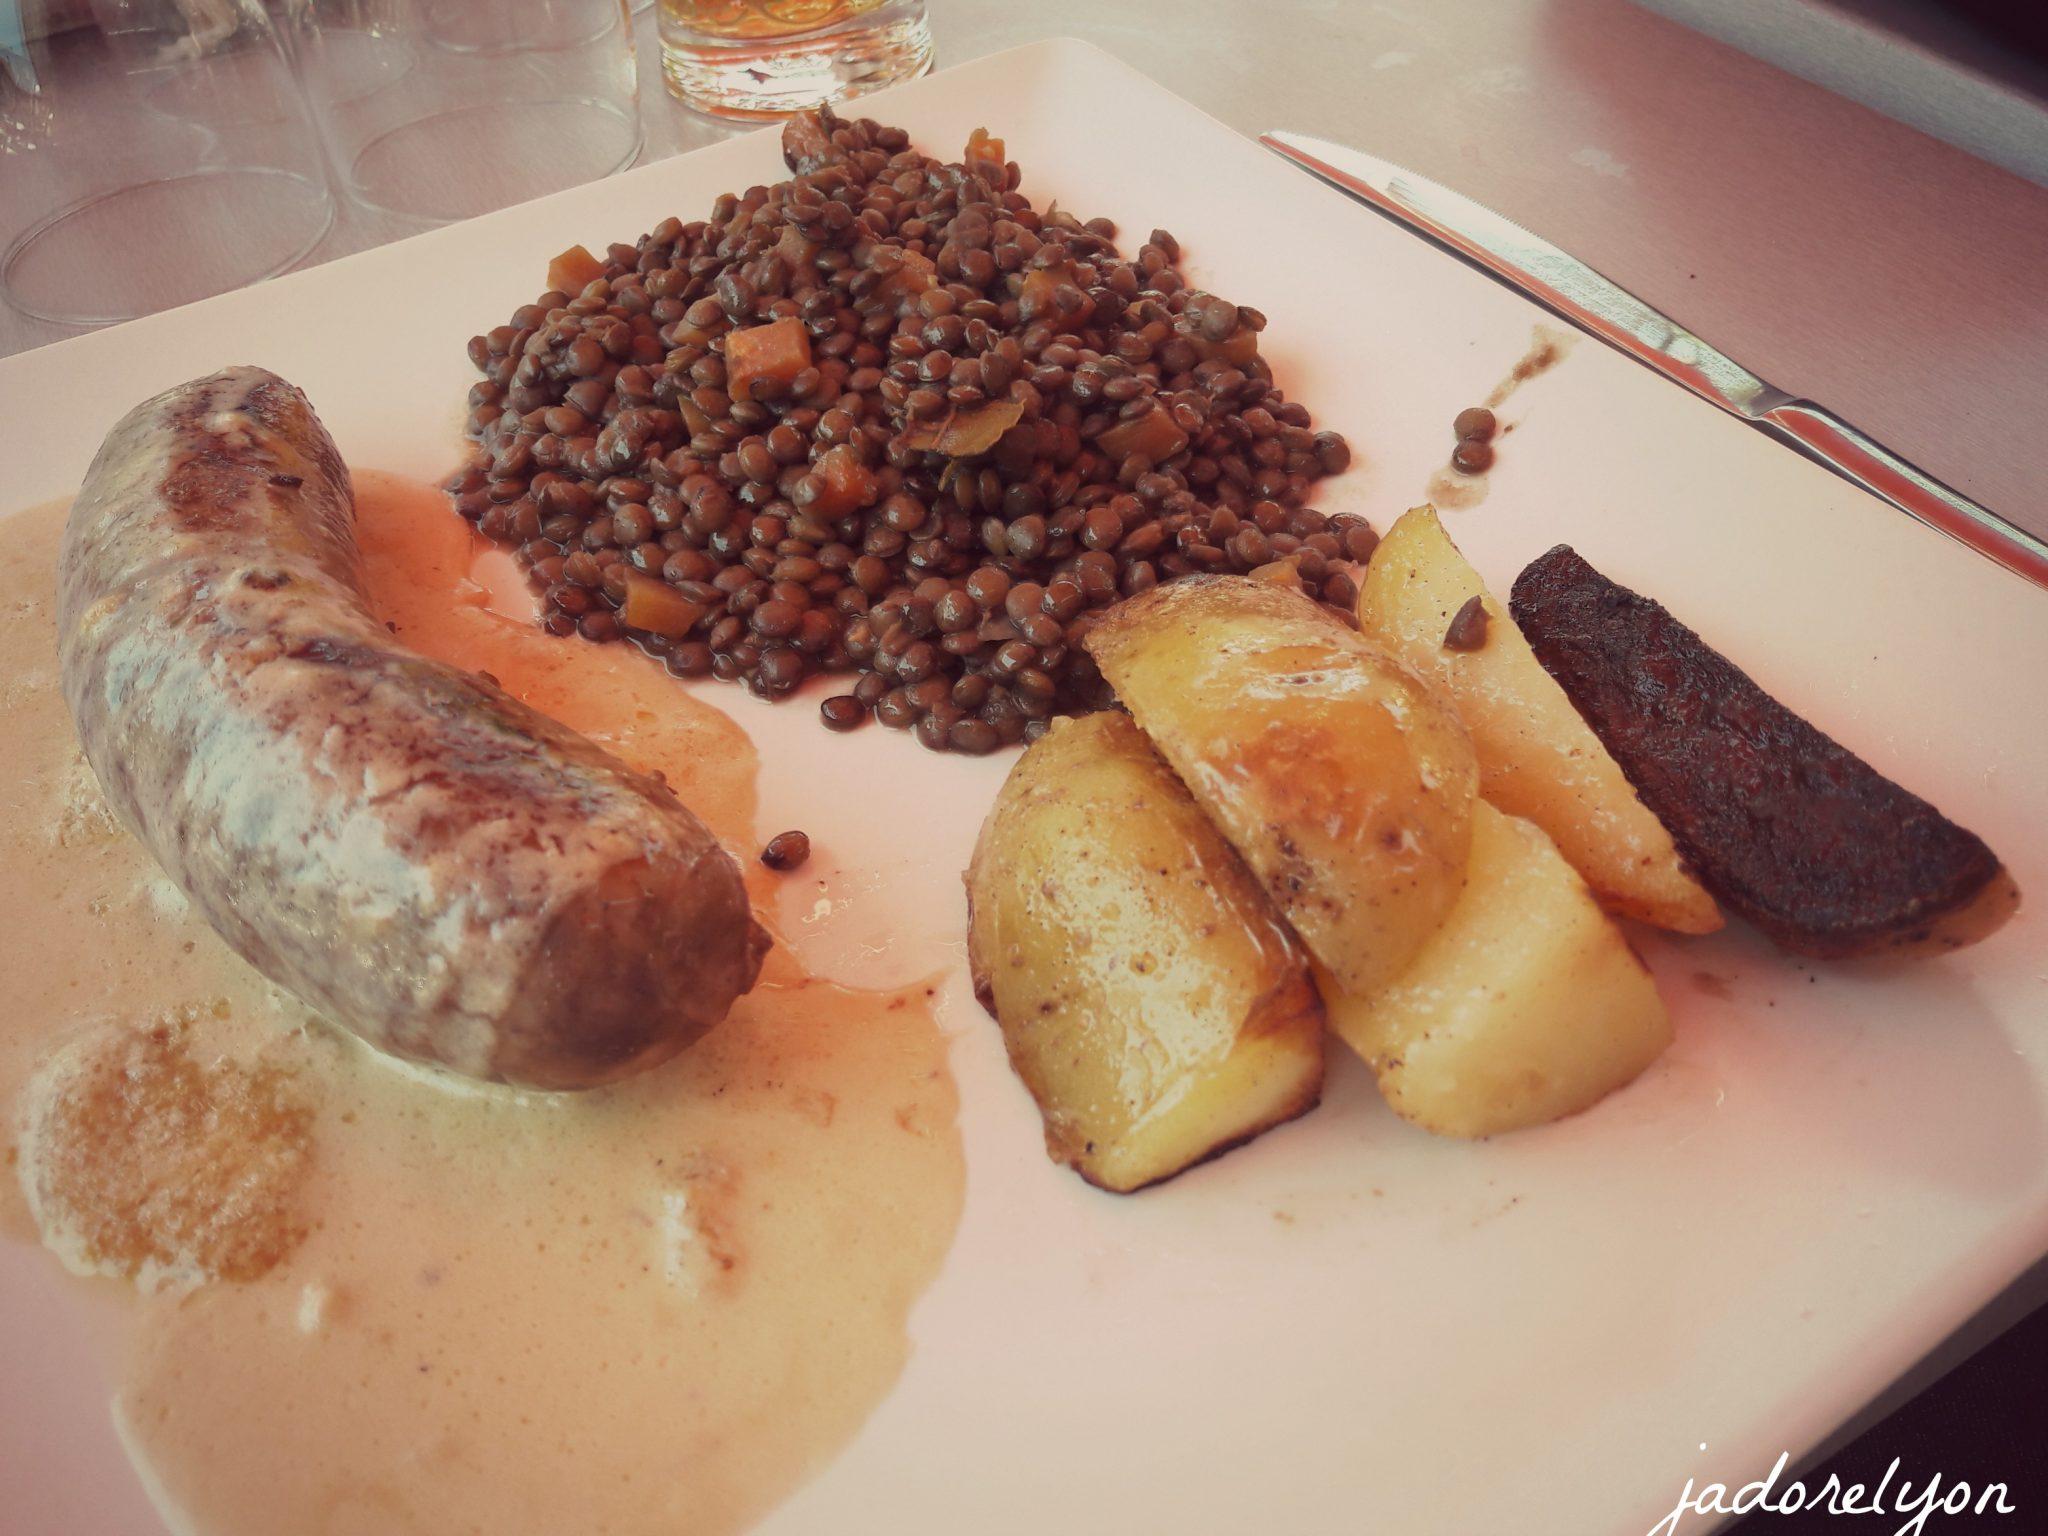 Le Puy en Velay Lentills and the Sausage of Le Puy en Velay